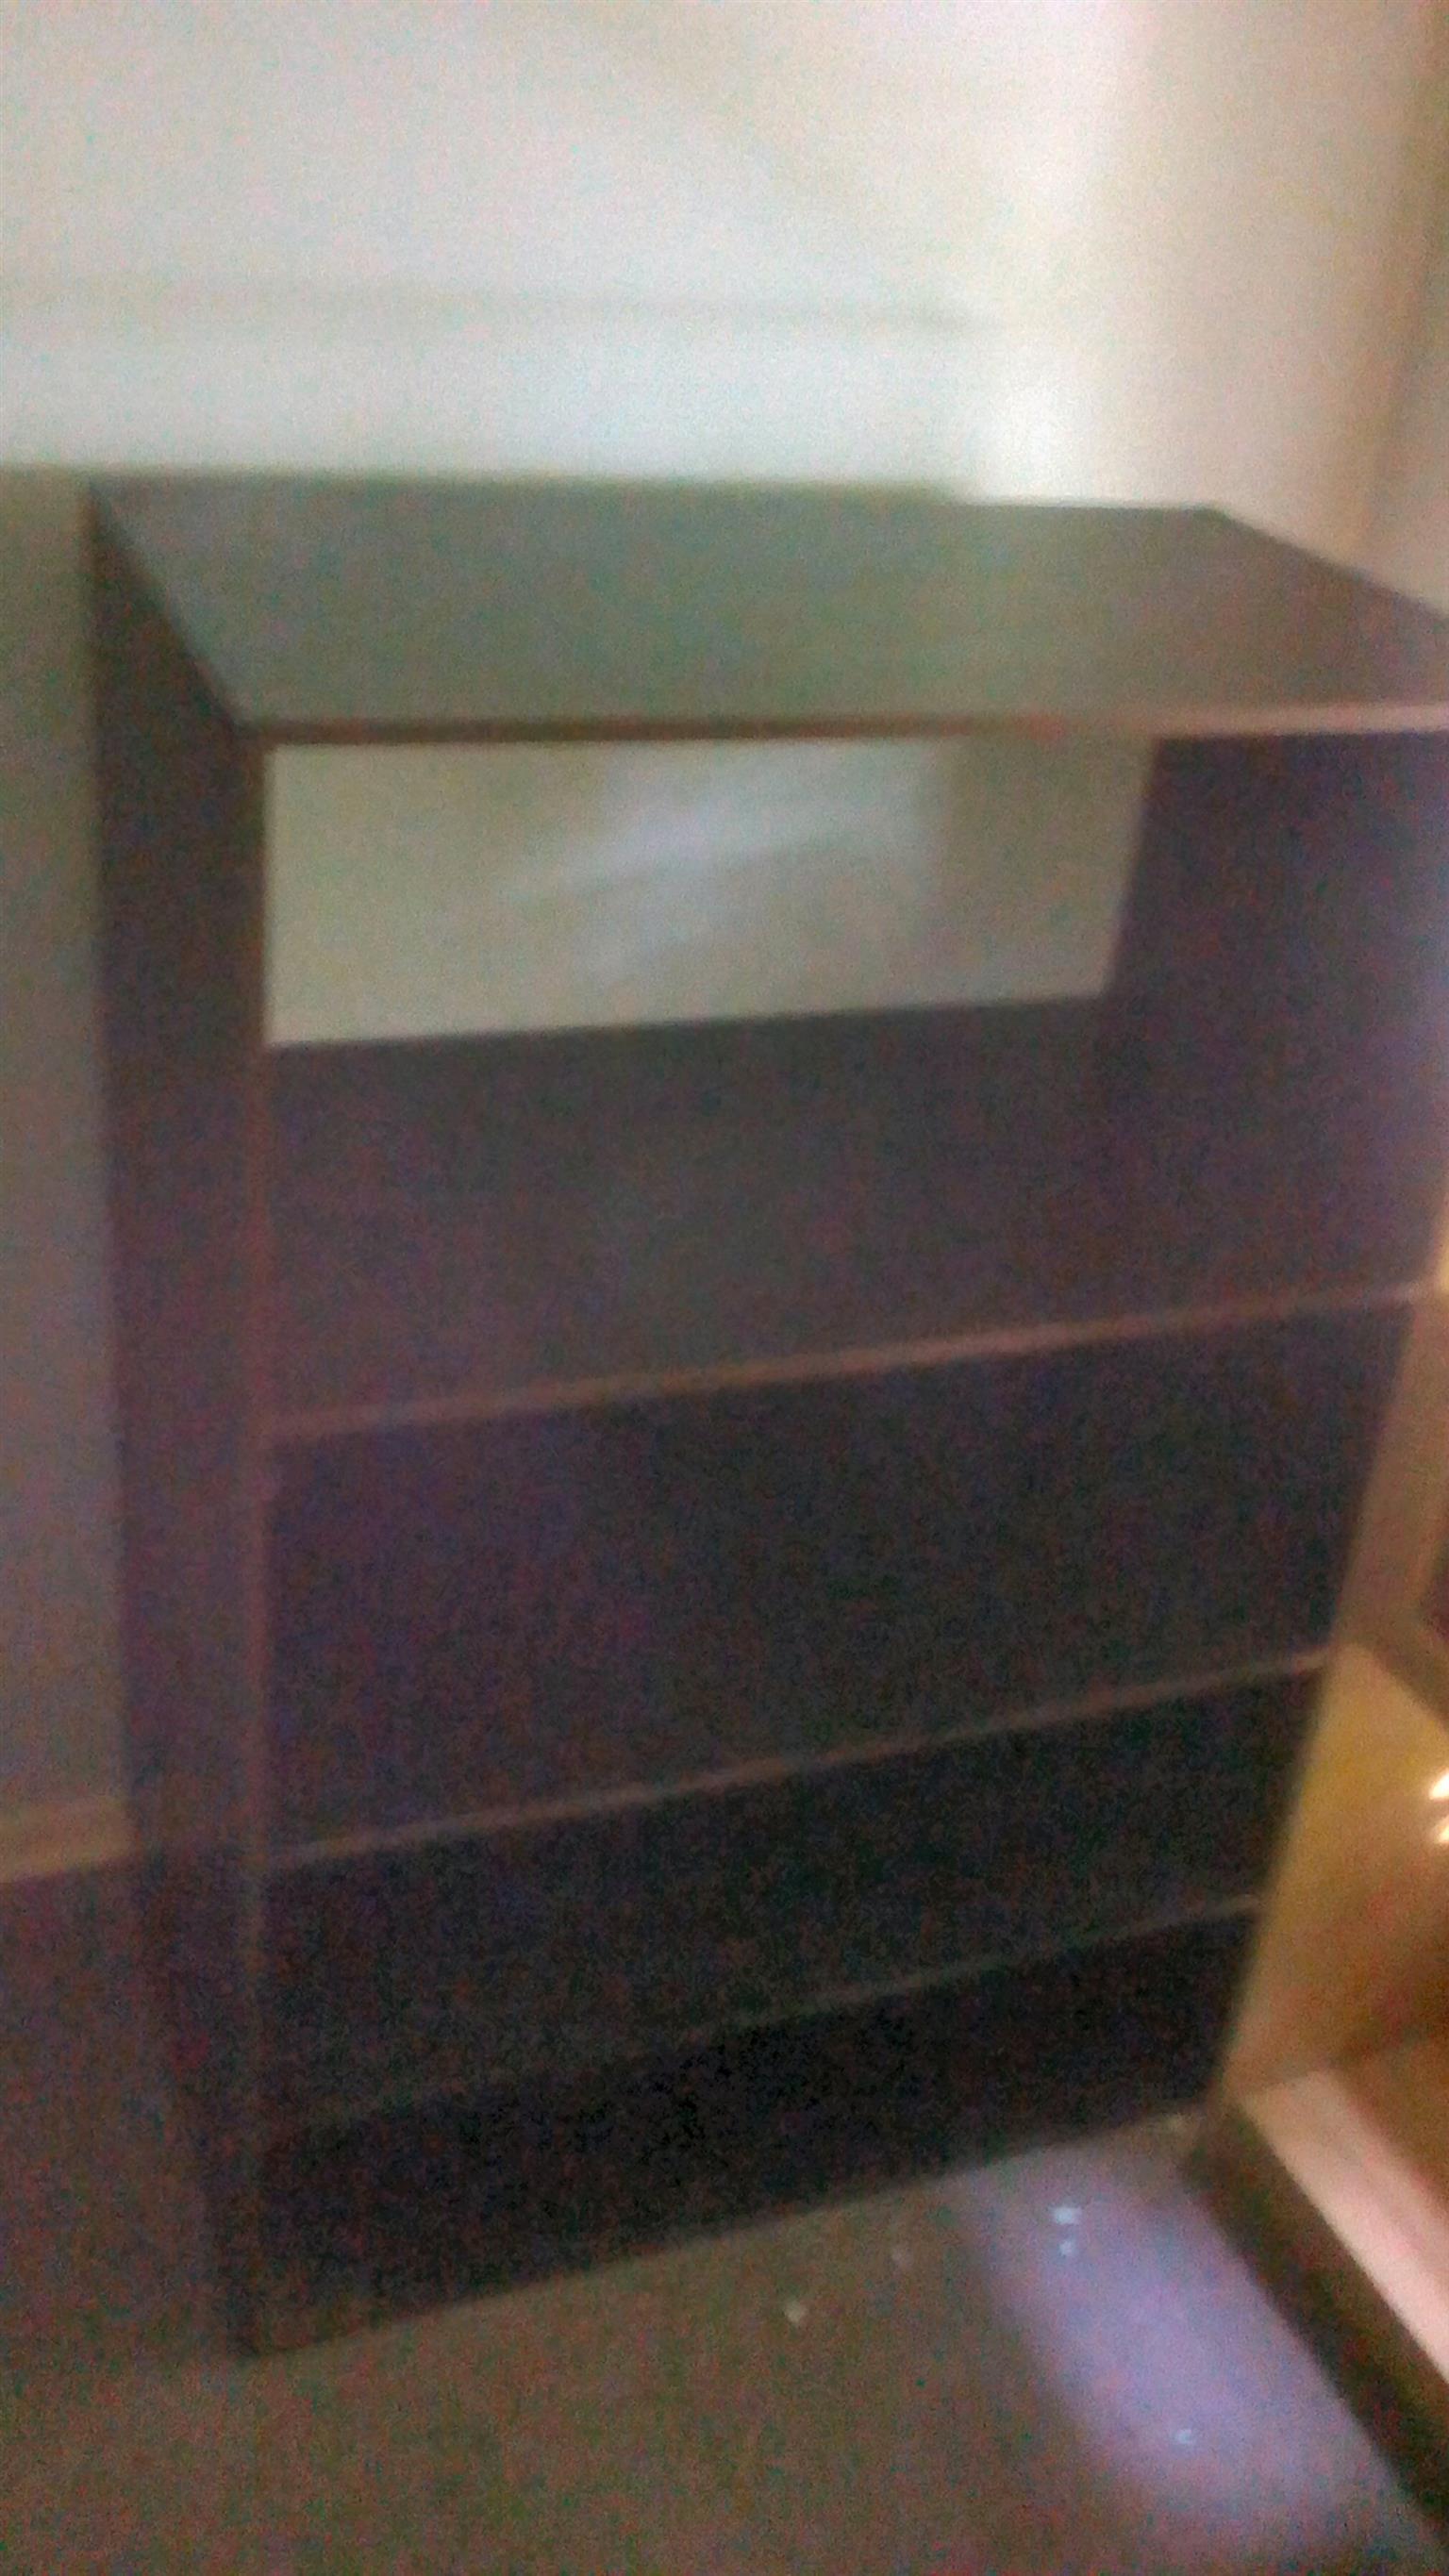 Big 4 tier wooden shelf for sale R550